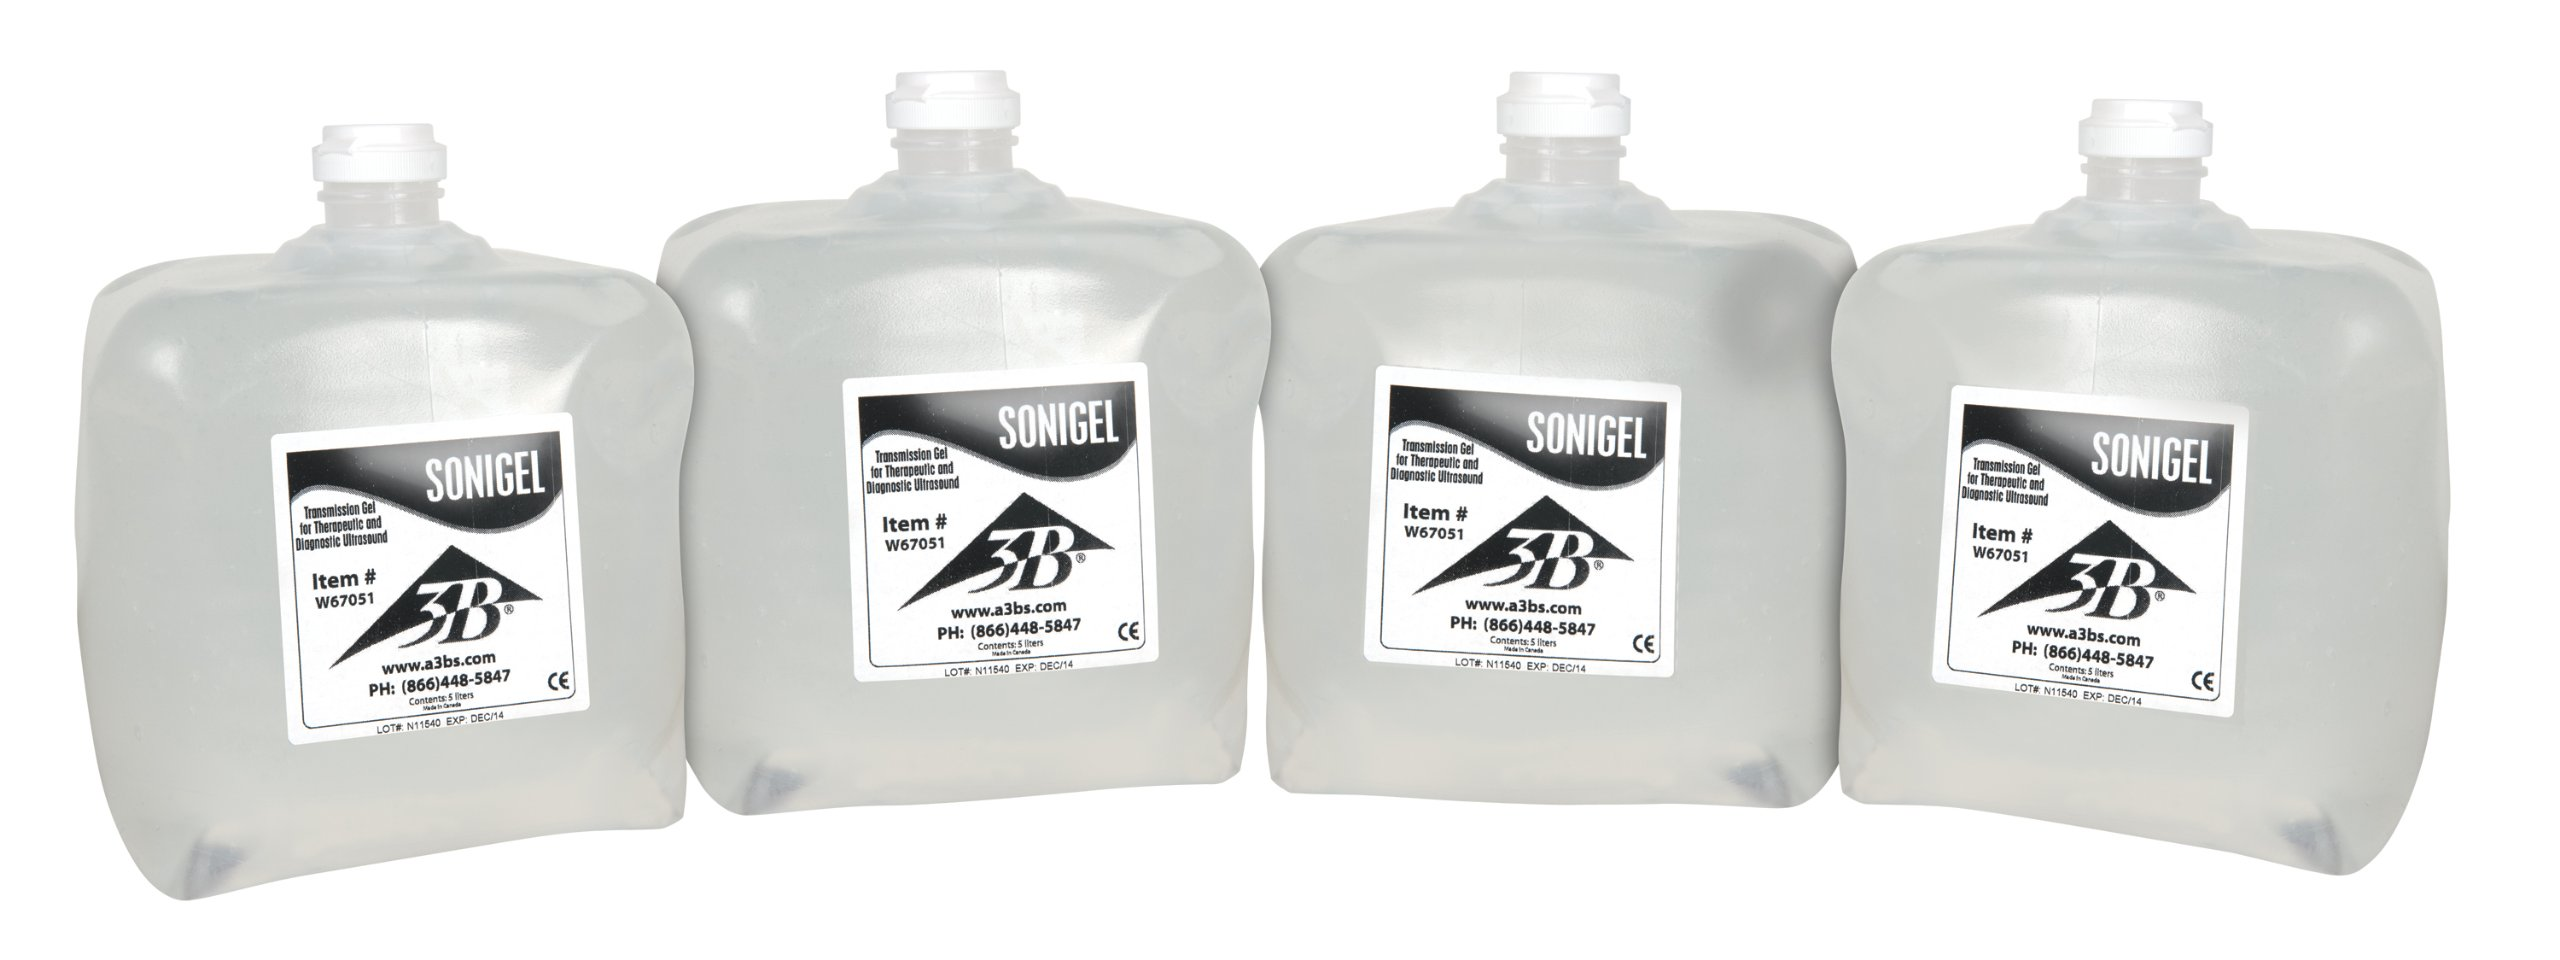 3B Scientific W67052 Sonigel Ultrasound Gel, 5L Container (Pack of 4)